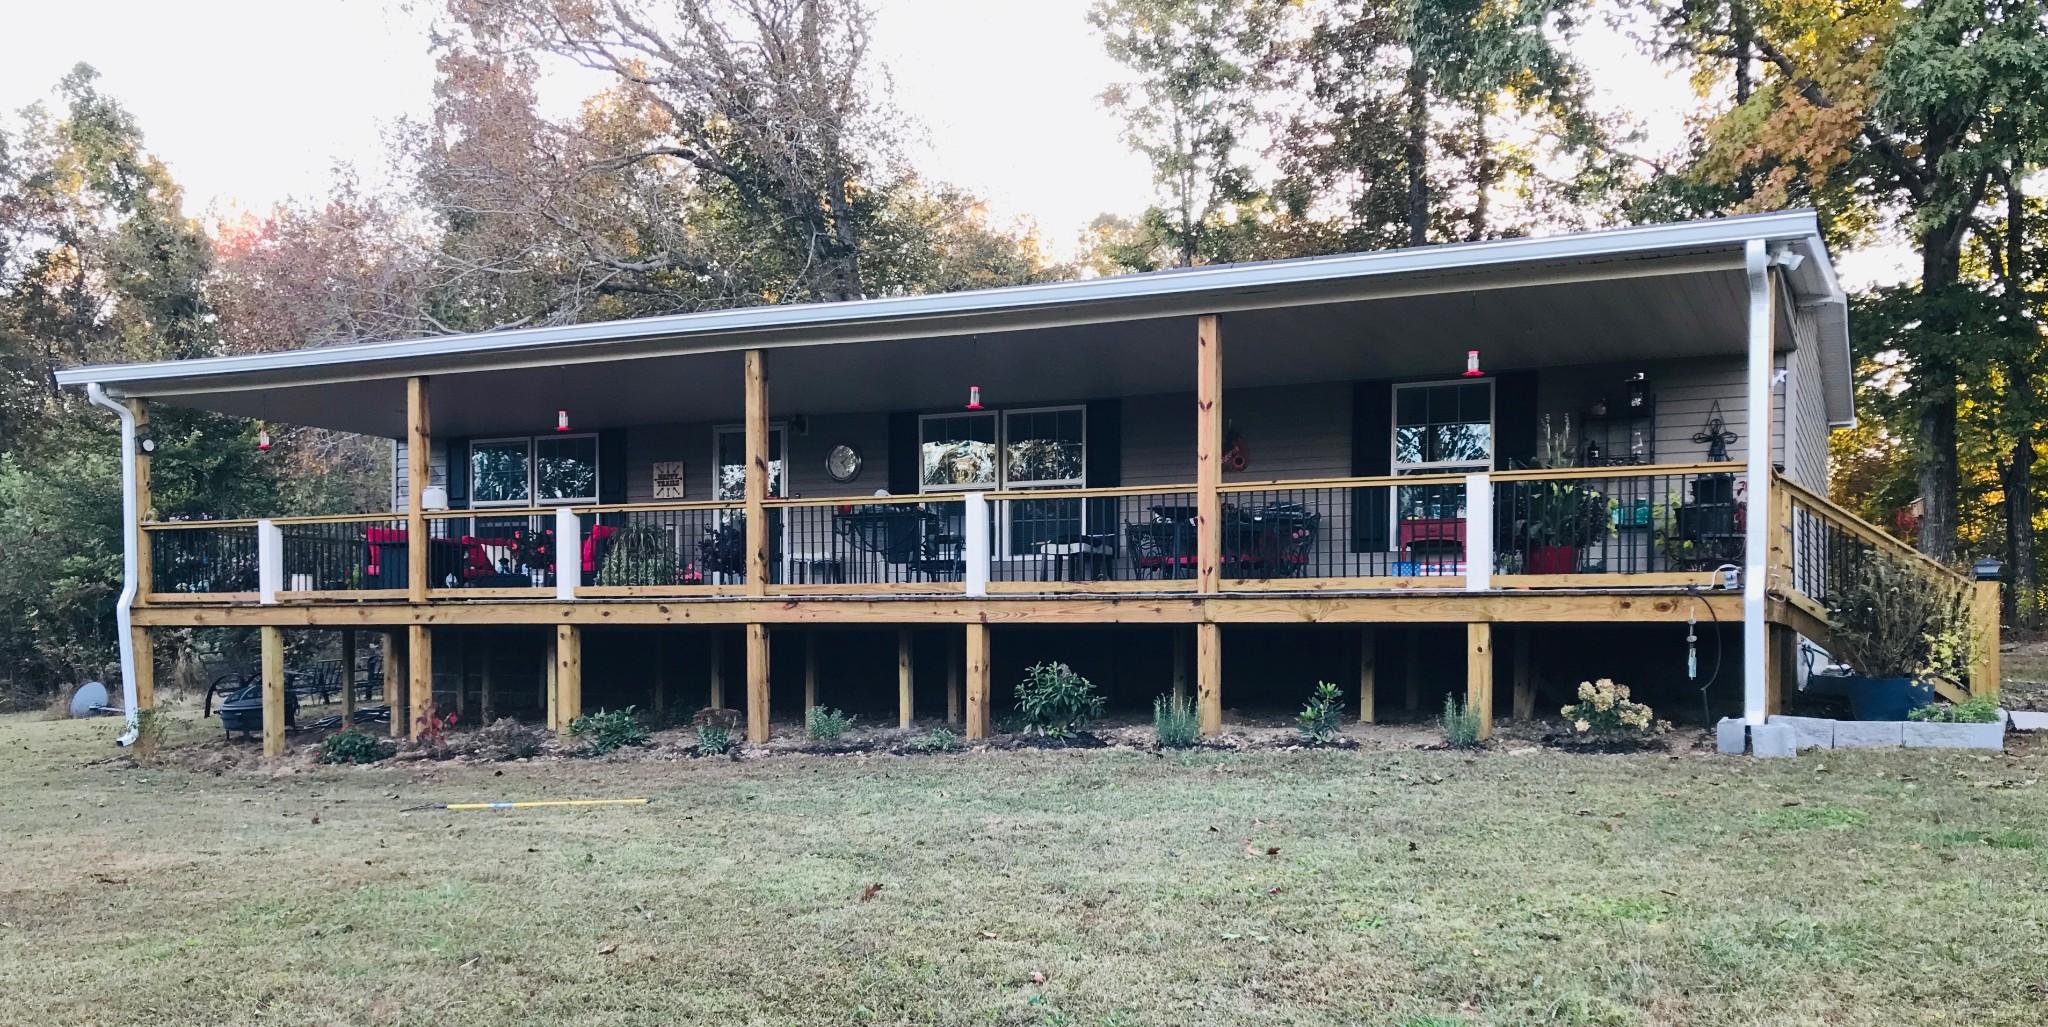 519 Bennett Hill Rd, Red Boiling Springs, TN 37150 - Red Boiling Springs, TN real estate listing